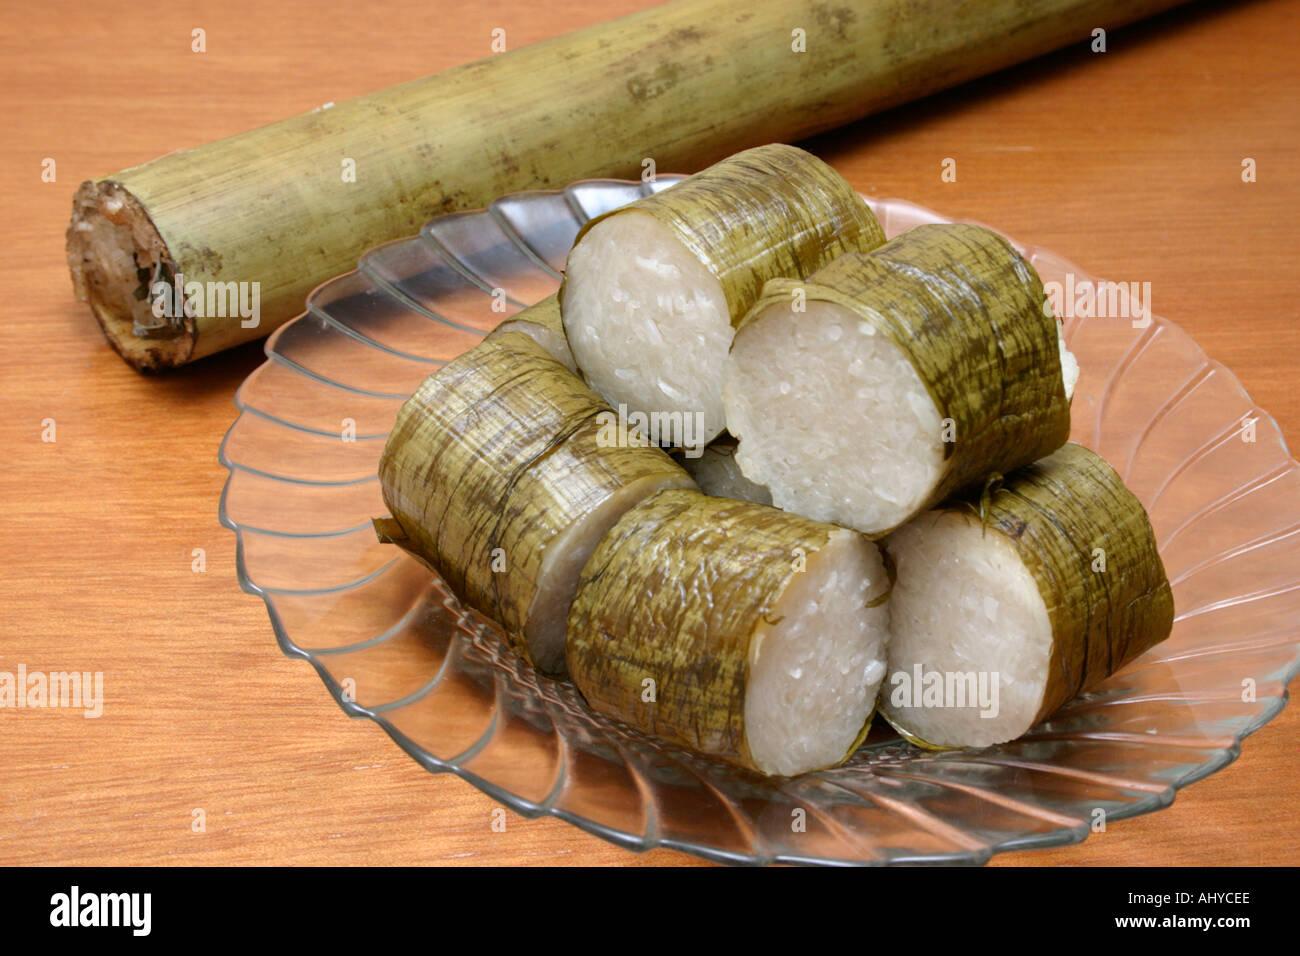 Download Hari Raya Eid Al-Fitr Food - lemang-is-a-malay-delicacy-served-during-eid-ul-fitr-made-of-glutinous-AHYCEE  Trends_829645 .jpg